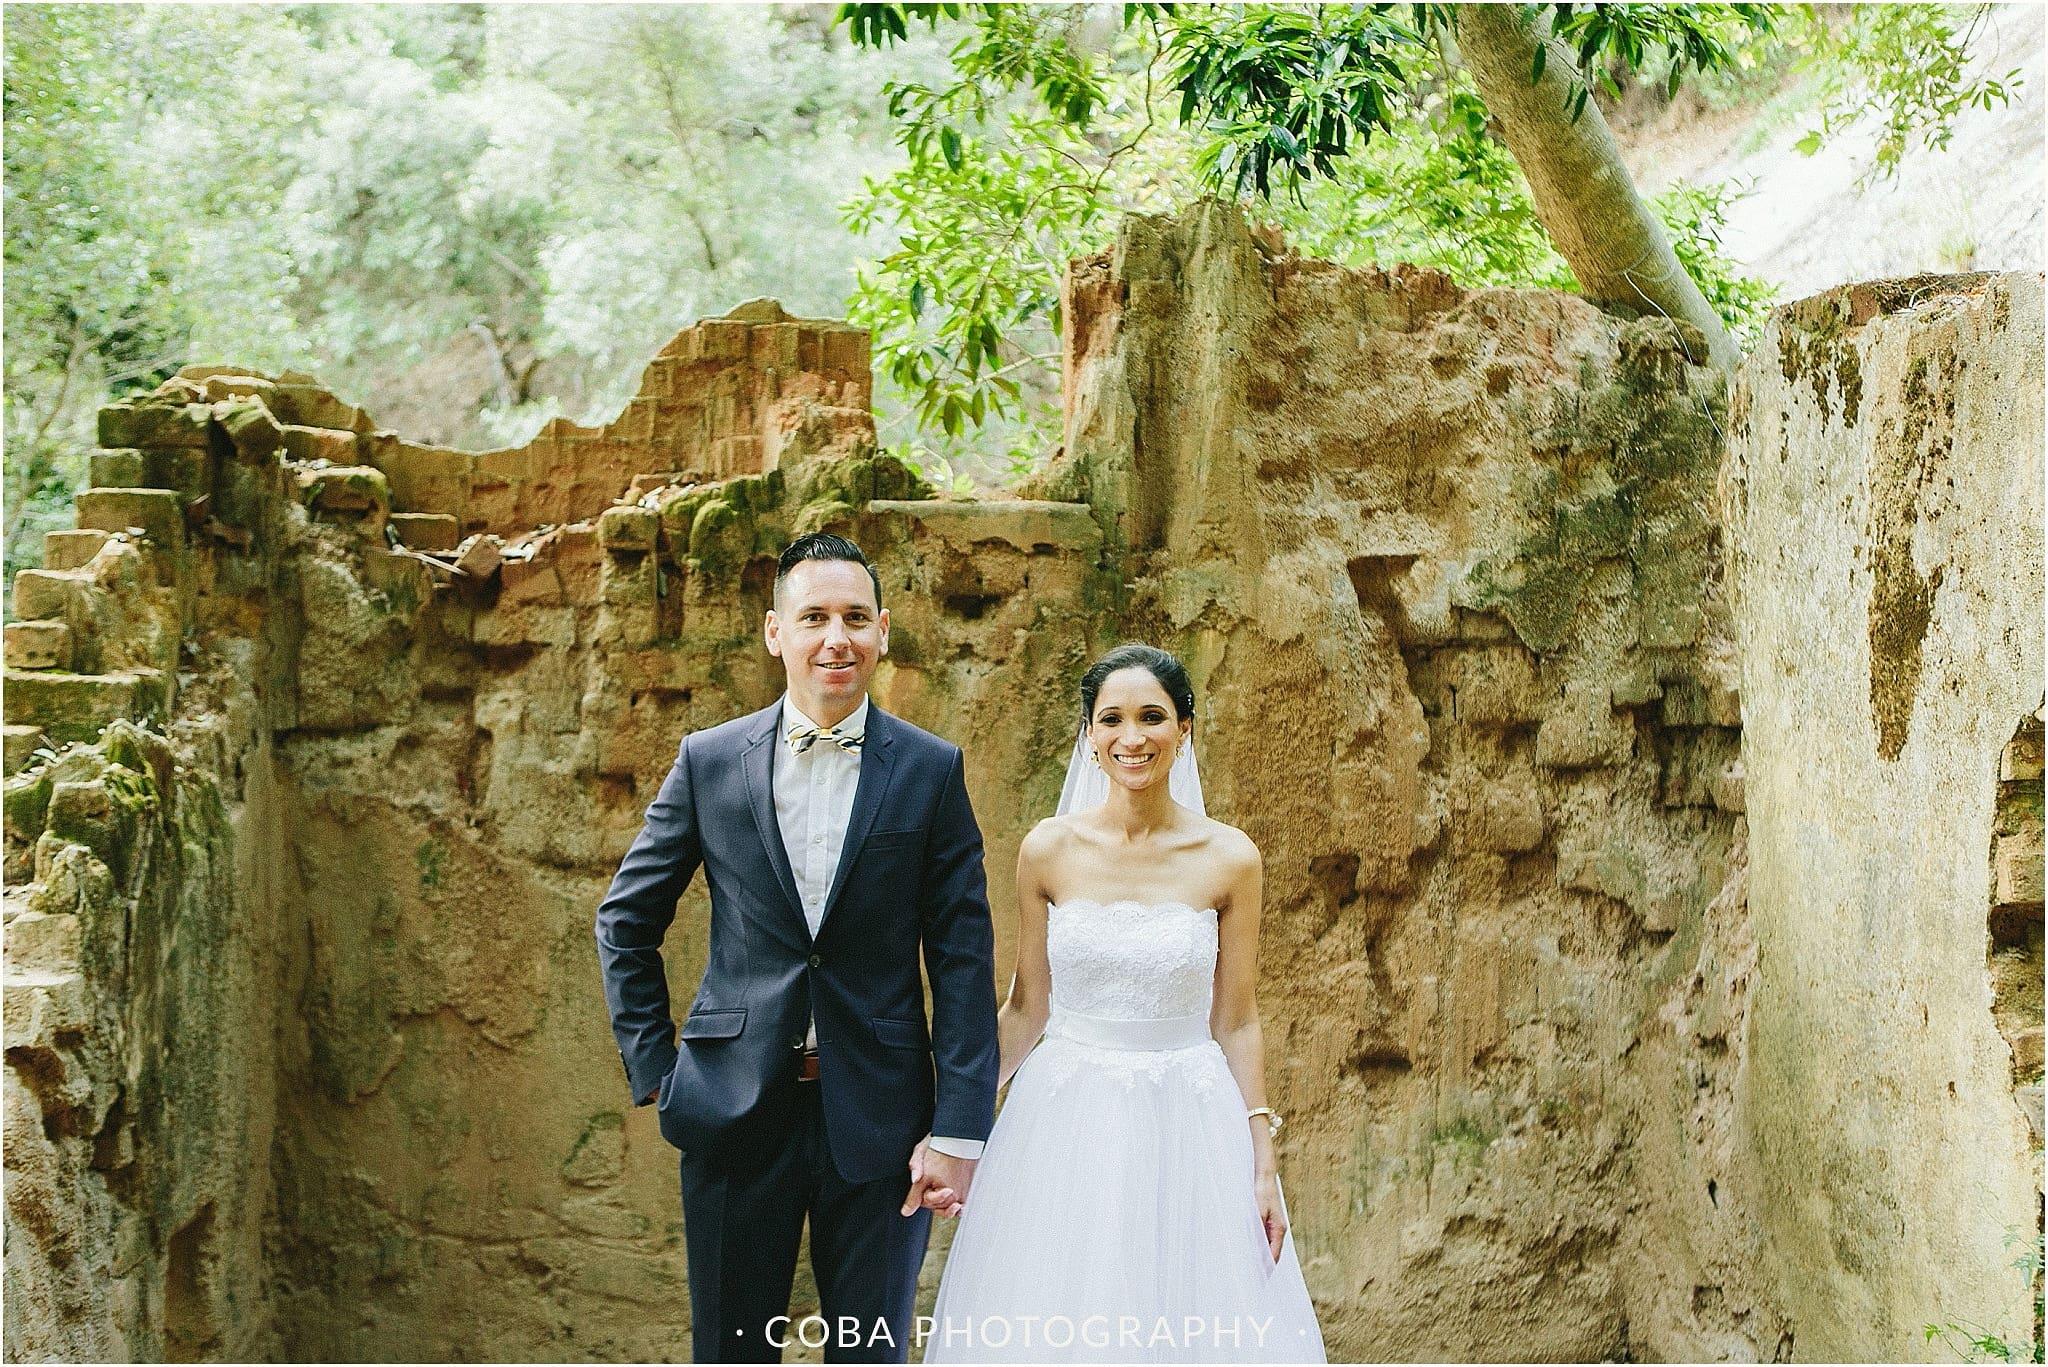 Marc&Melissa - Cascade Manor - Coba Photography (164)